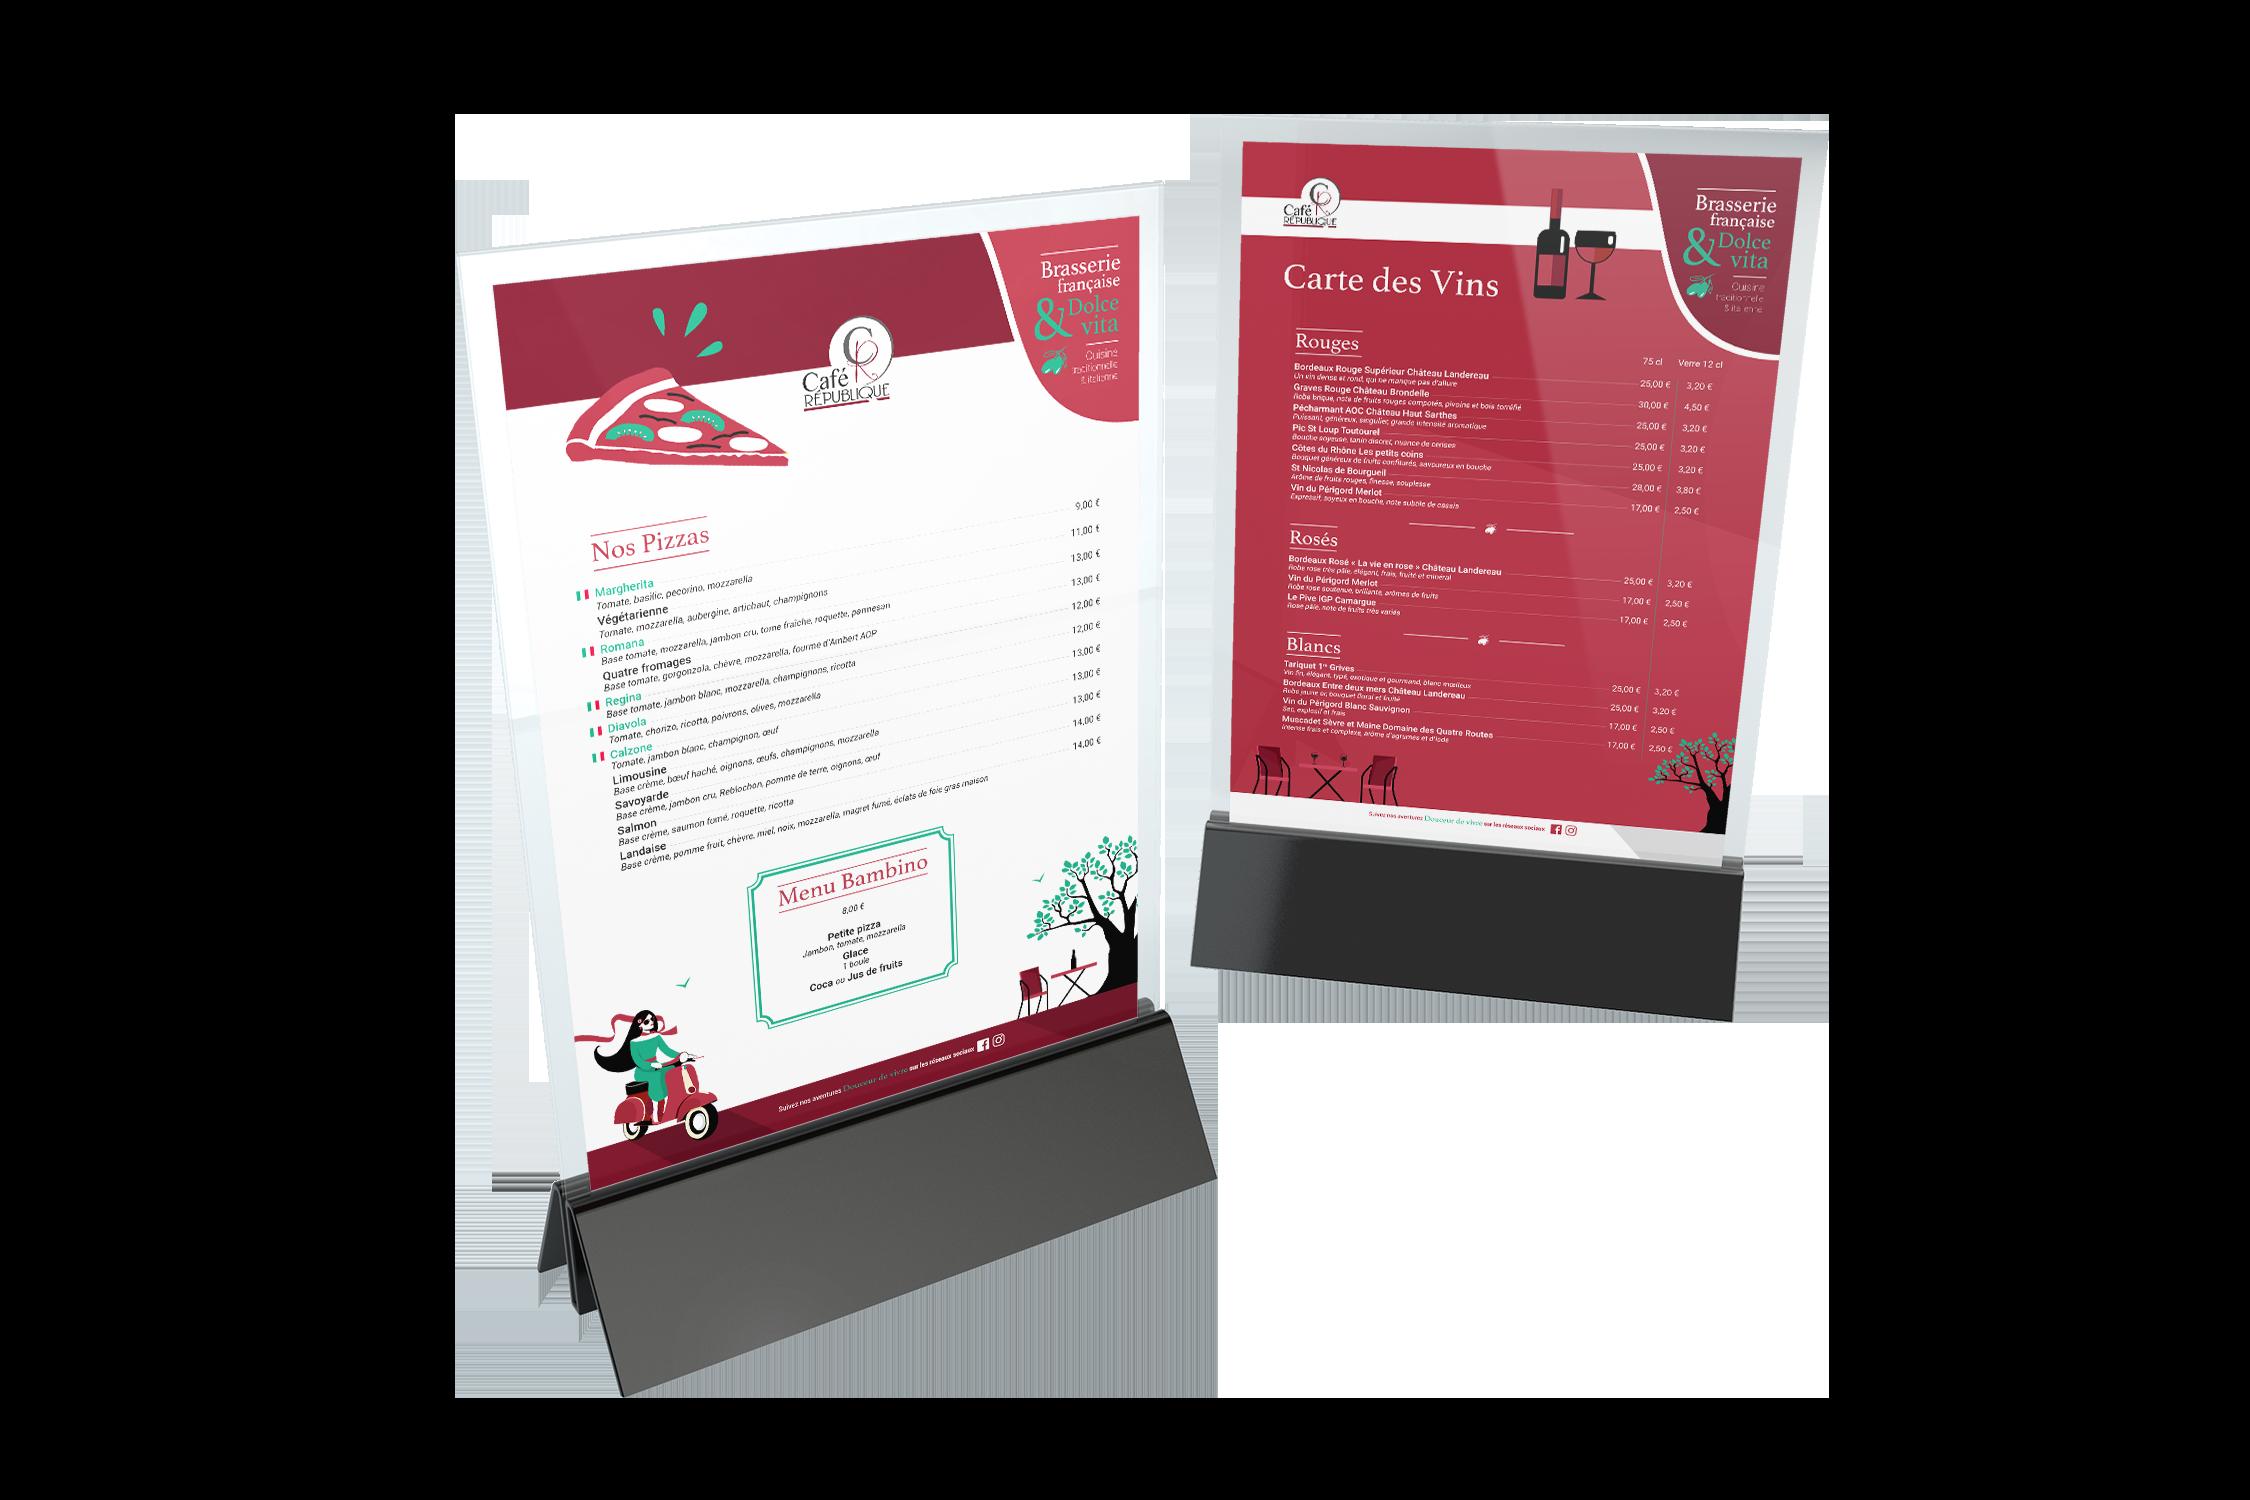 cafe-republique-cartes-menu-print-supports-imprimes-redaction